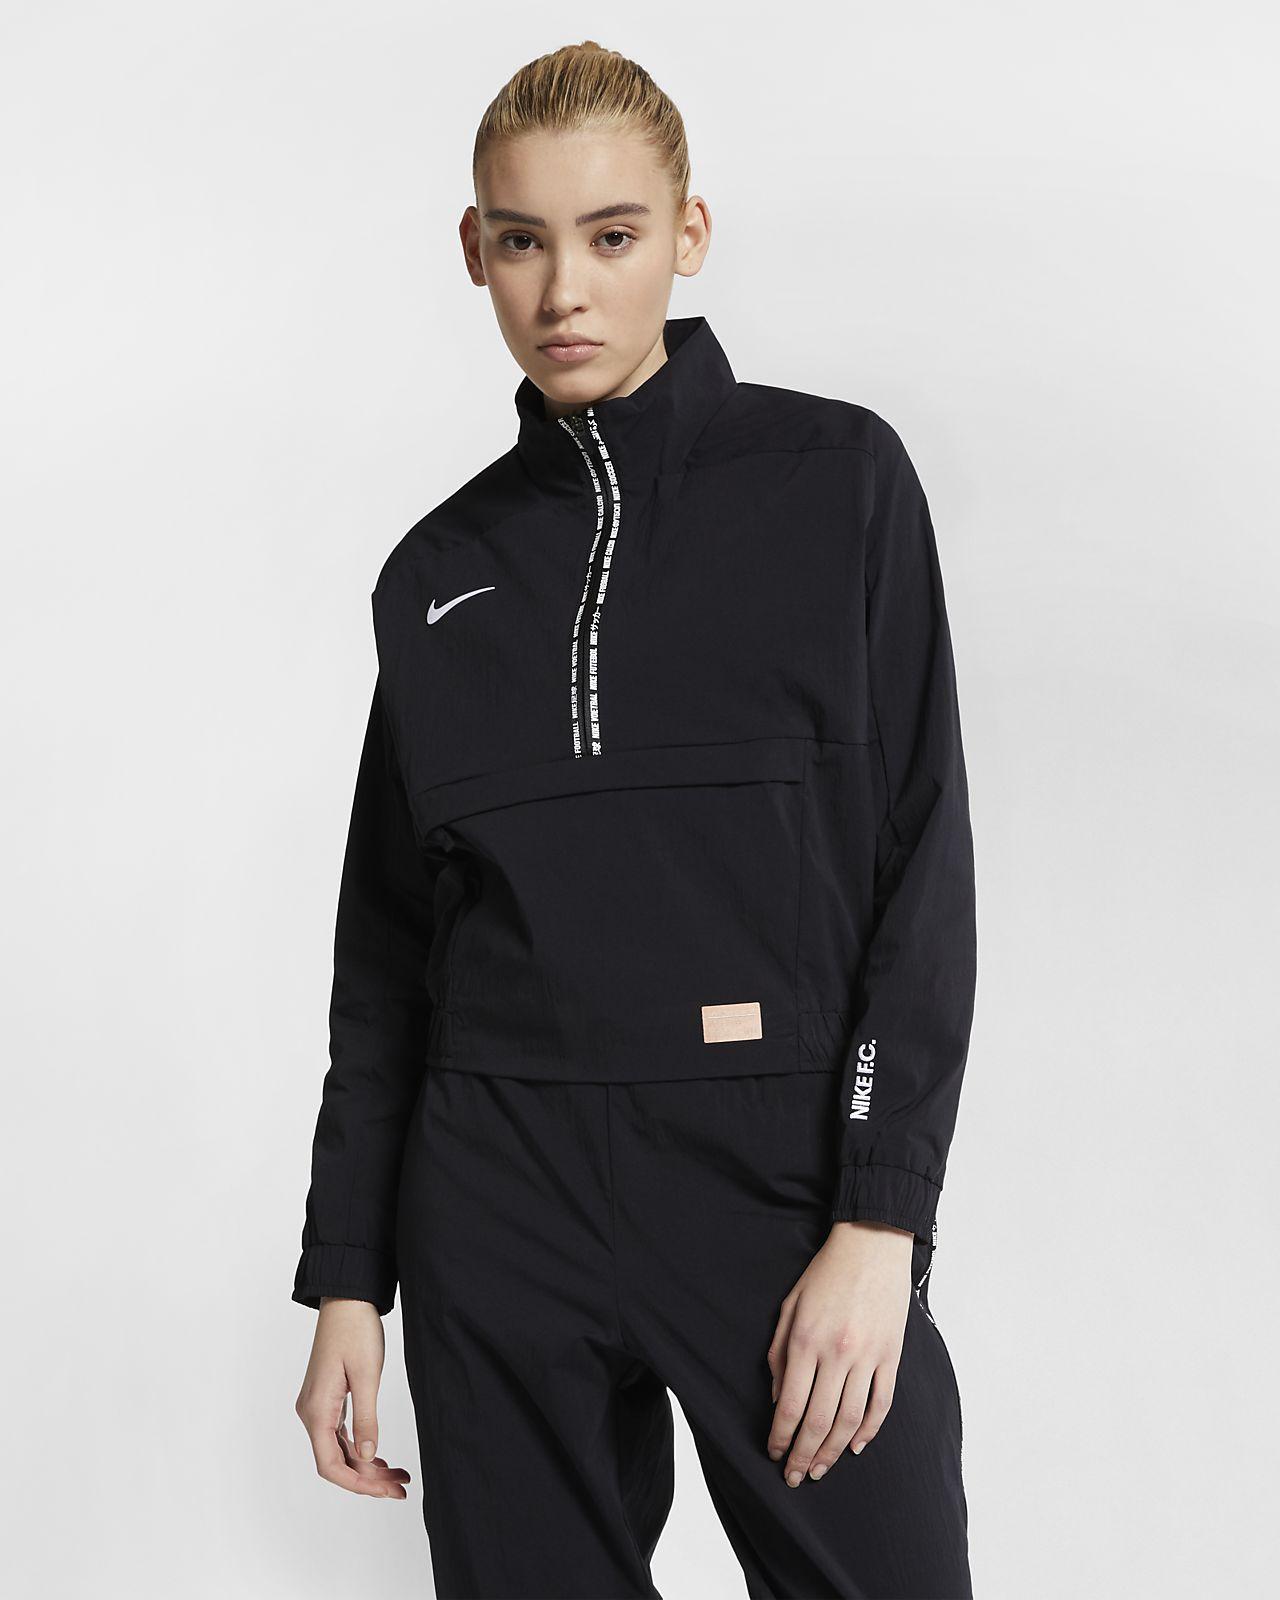 Maglia da calcio a manica lunga Nike F.C. - Donna